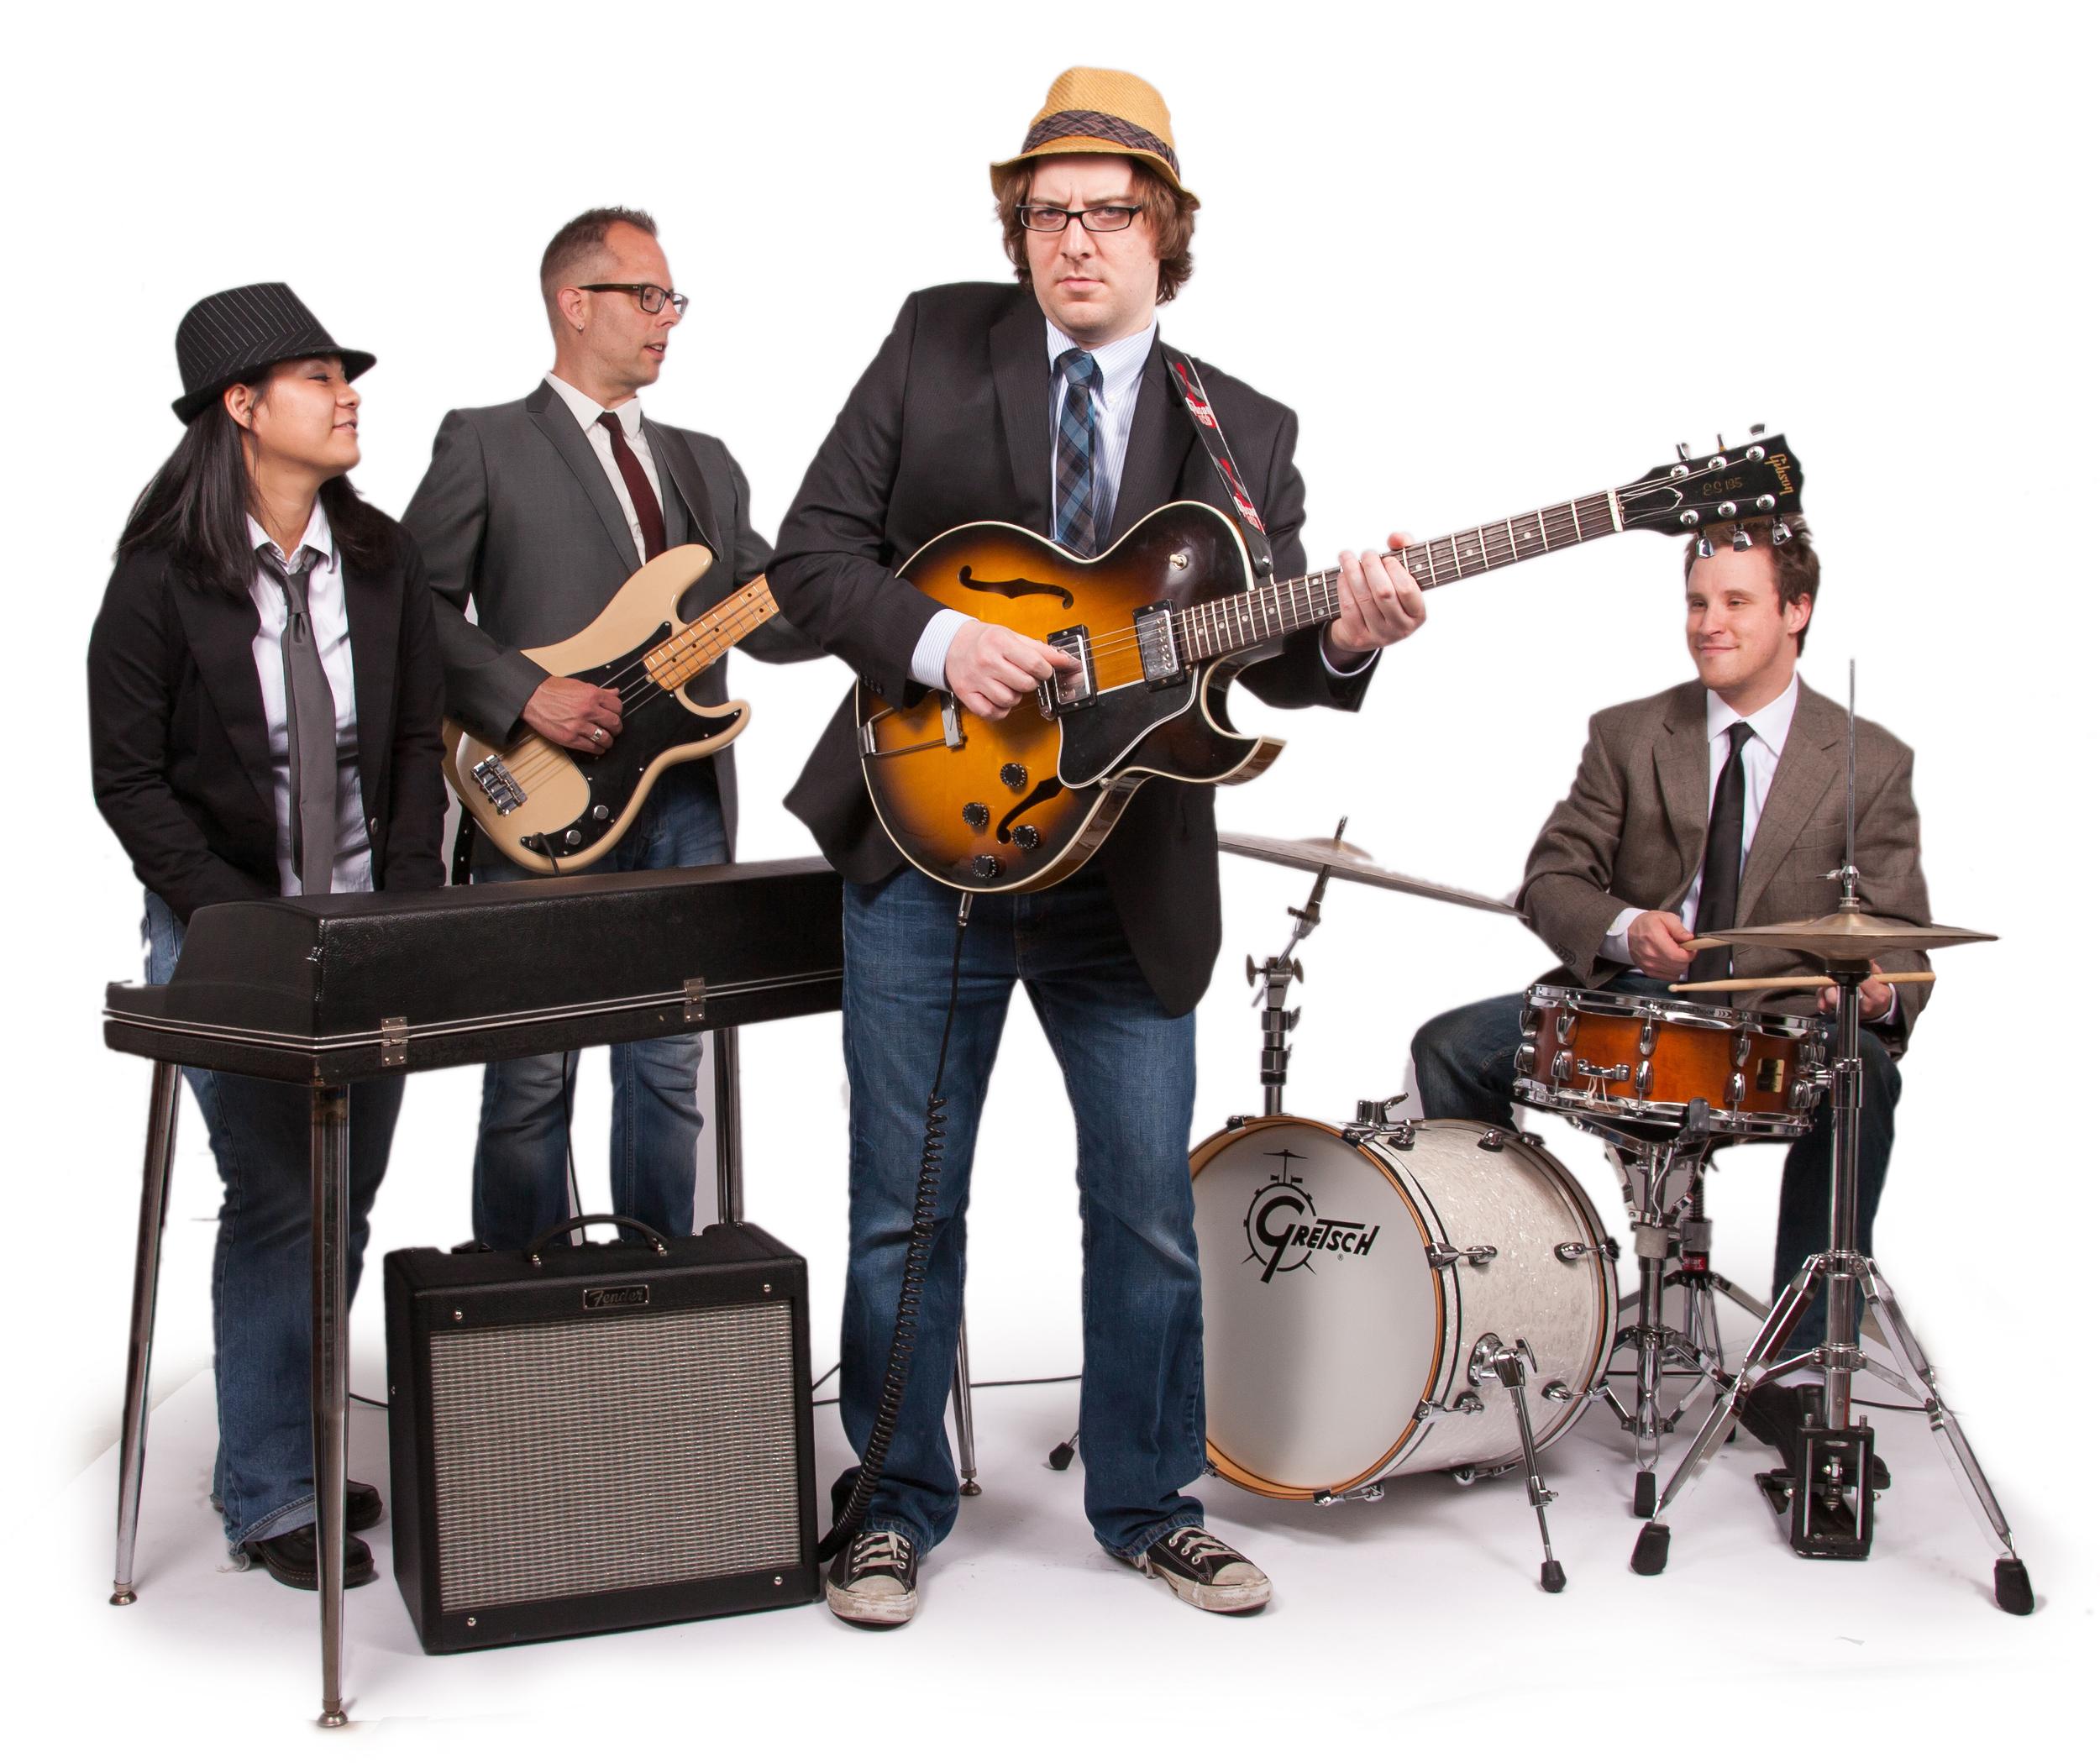 Adam Dalton & The B-Sides  - Kazuri Arai (Keyboards), Dean Marold (Bass), Adam Dalton (Guitar) & Austin Lauritsen (Drums)